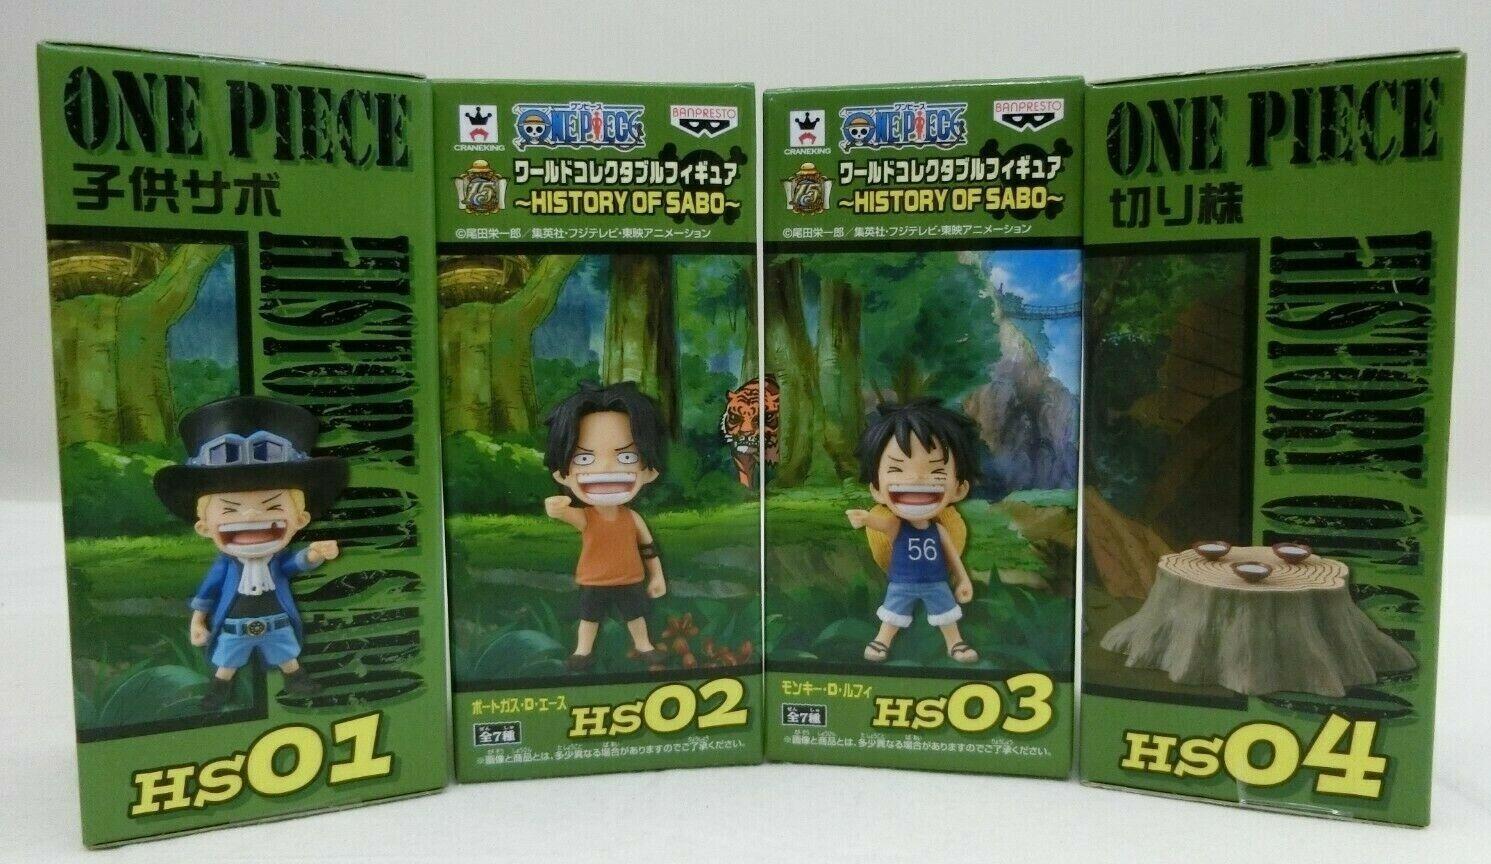 Banpresto One Piece History of Law World Collectible Figure Corazon BANP49840 US